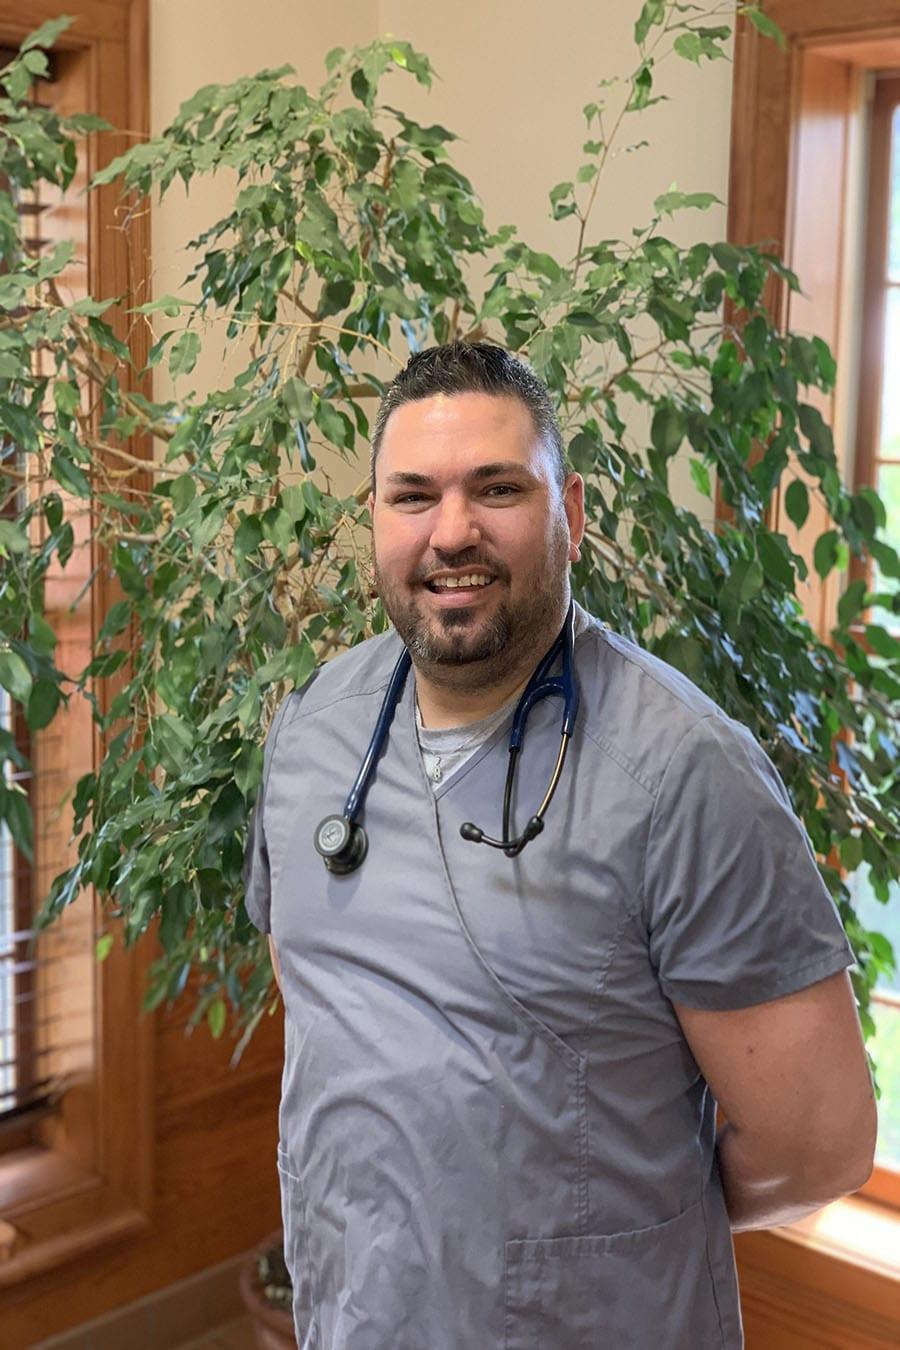 Jonathan-Burch, Veterinary Technician Assistant